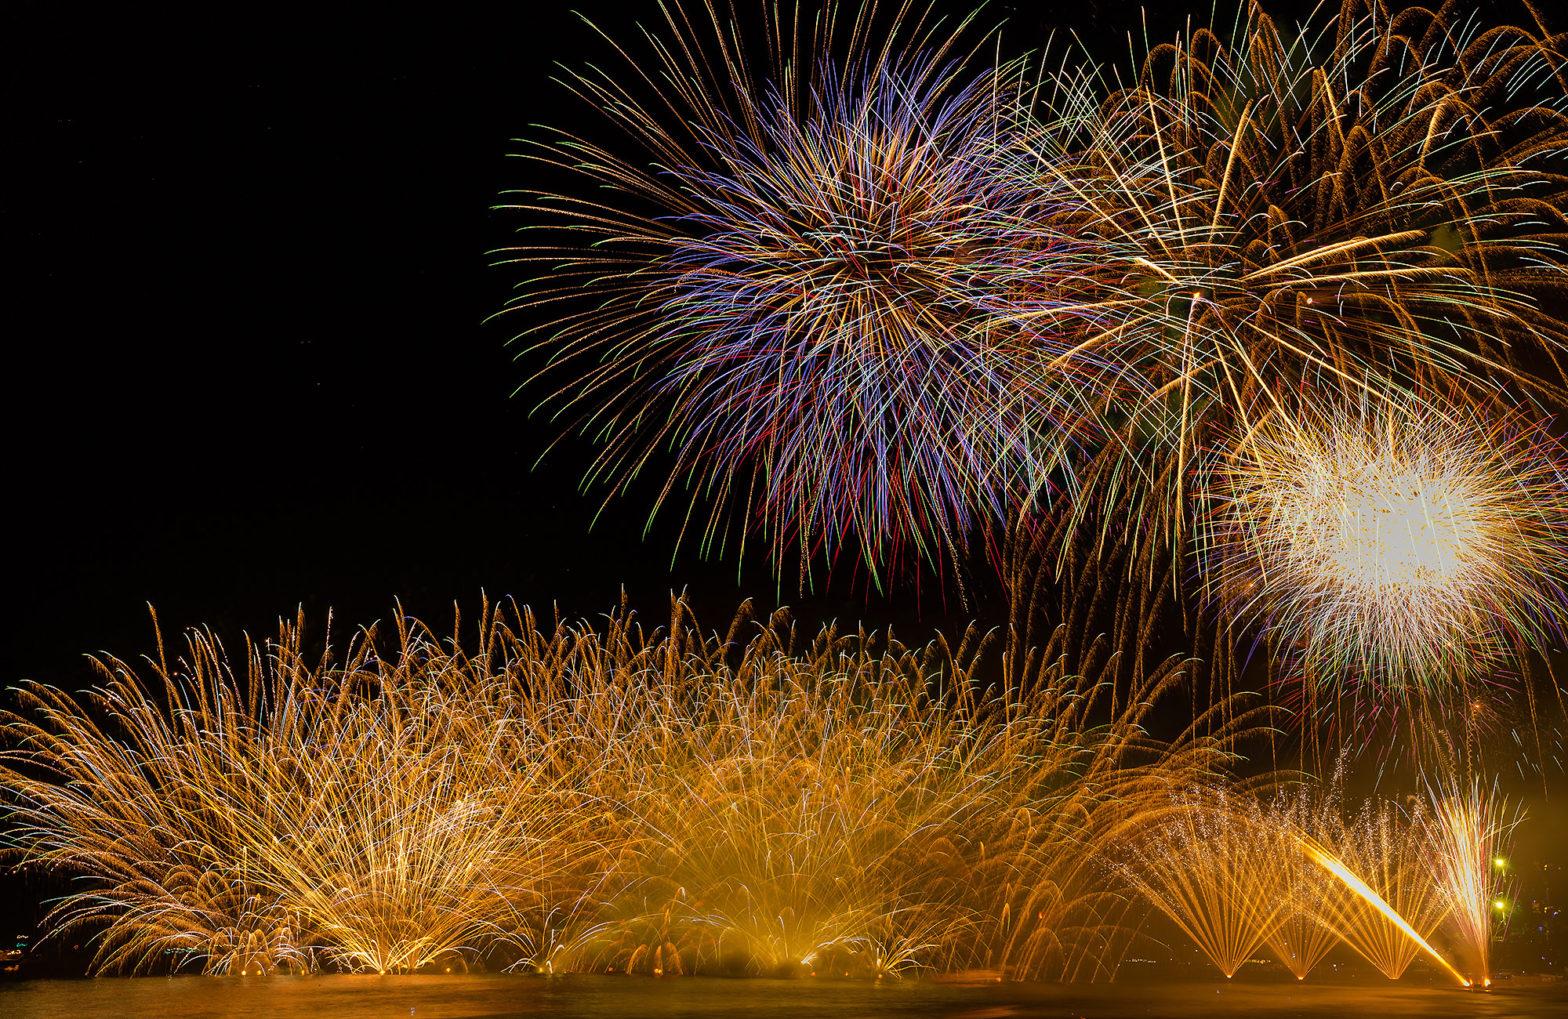 Yumigahama Fireworks